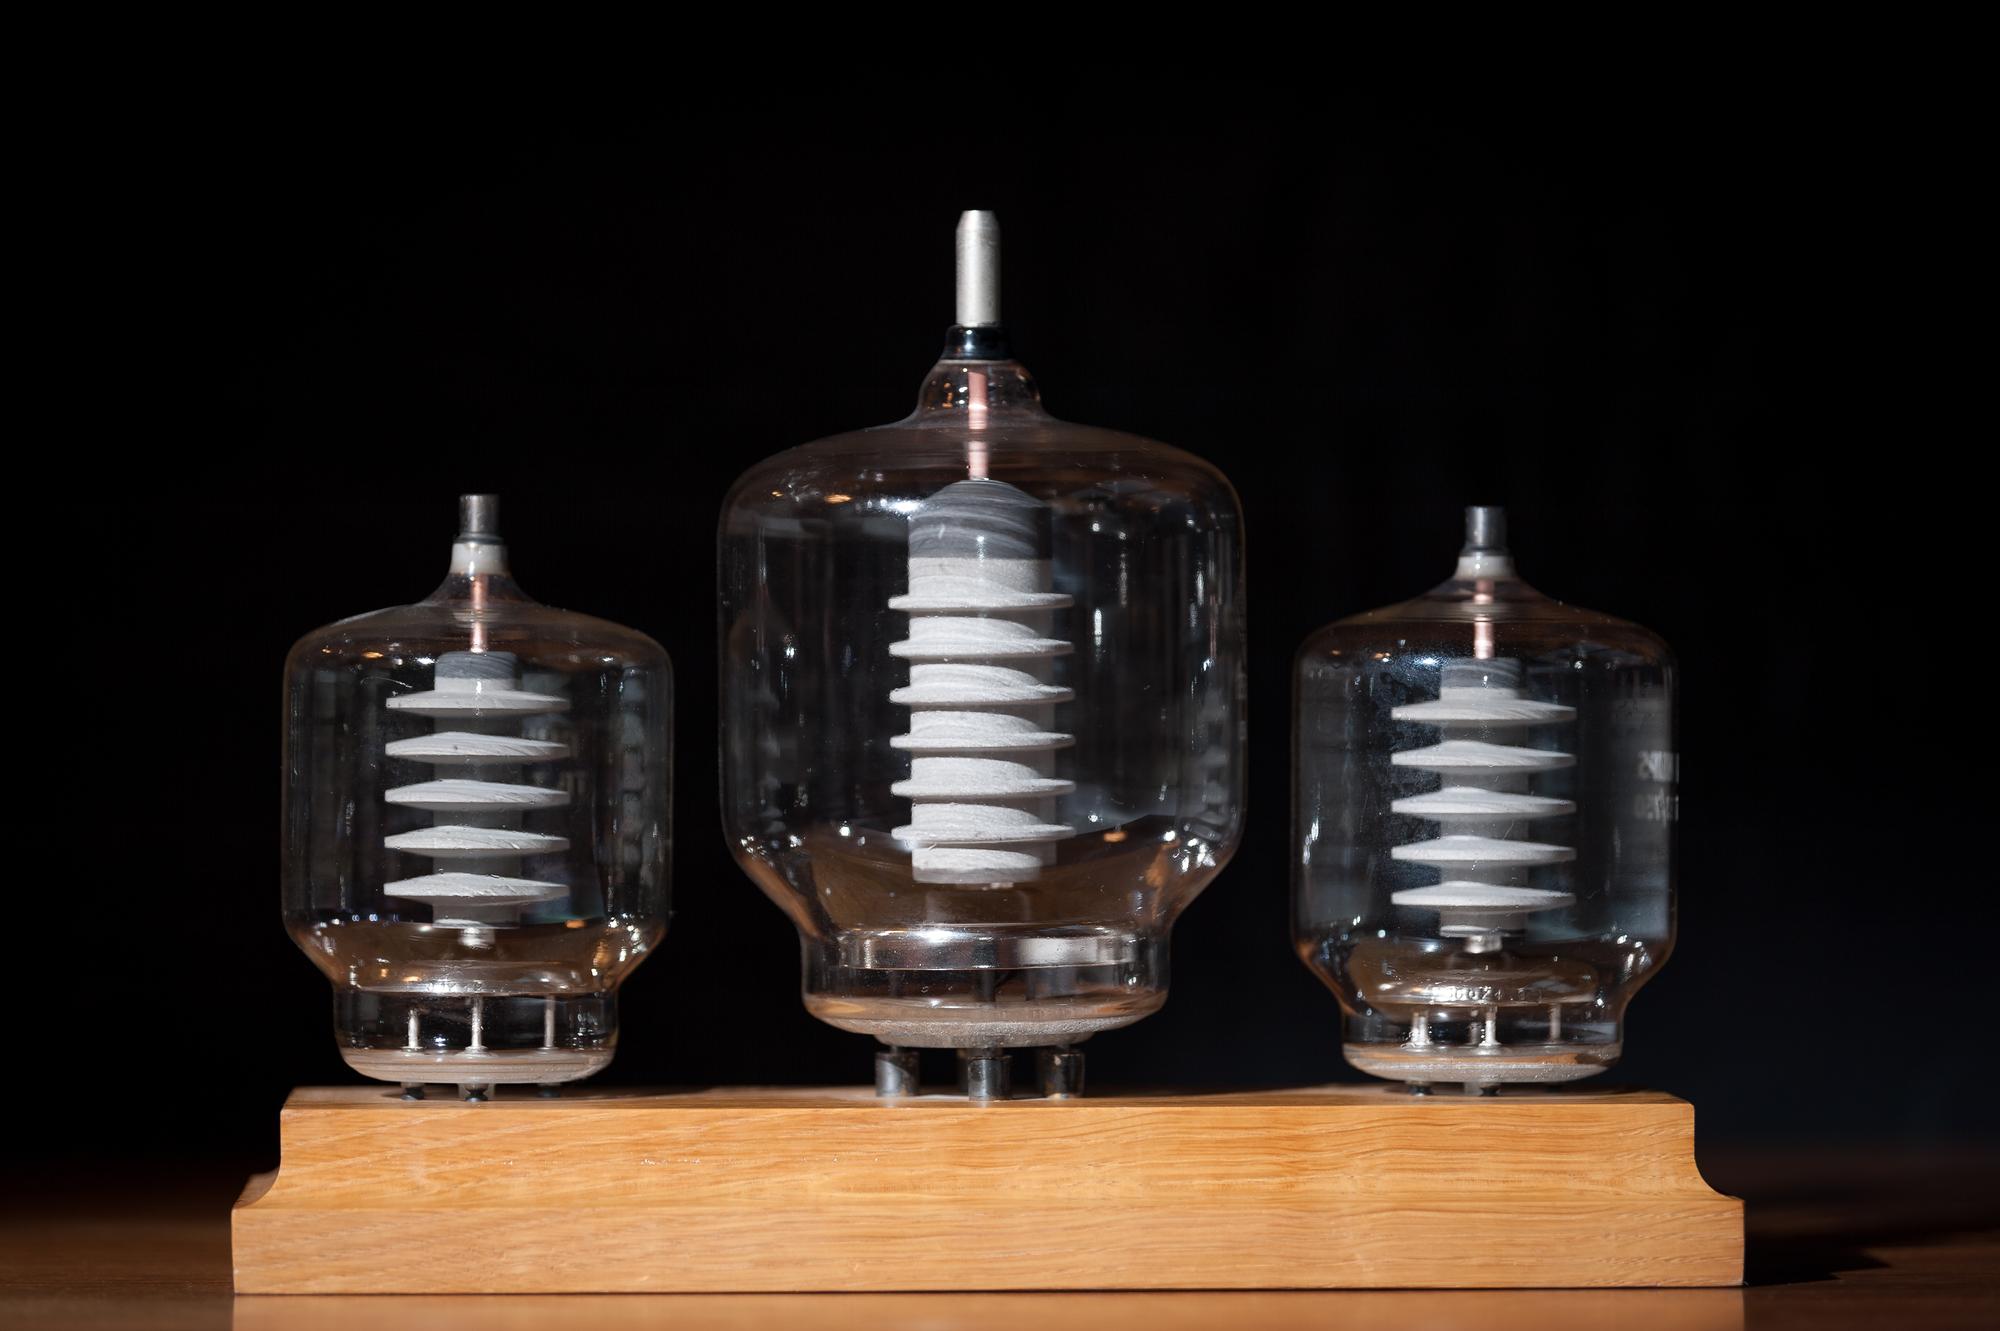 Douk Audio Mini 6J1 Vacuum Tube Pre-Amplifier Reviewed!